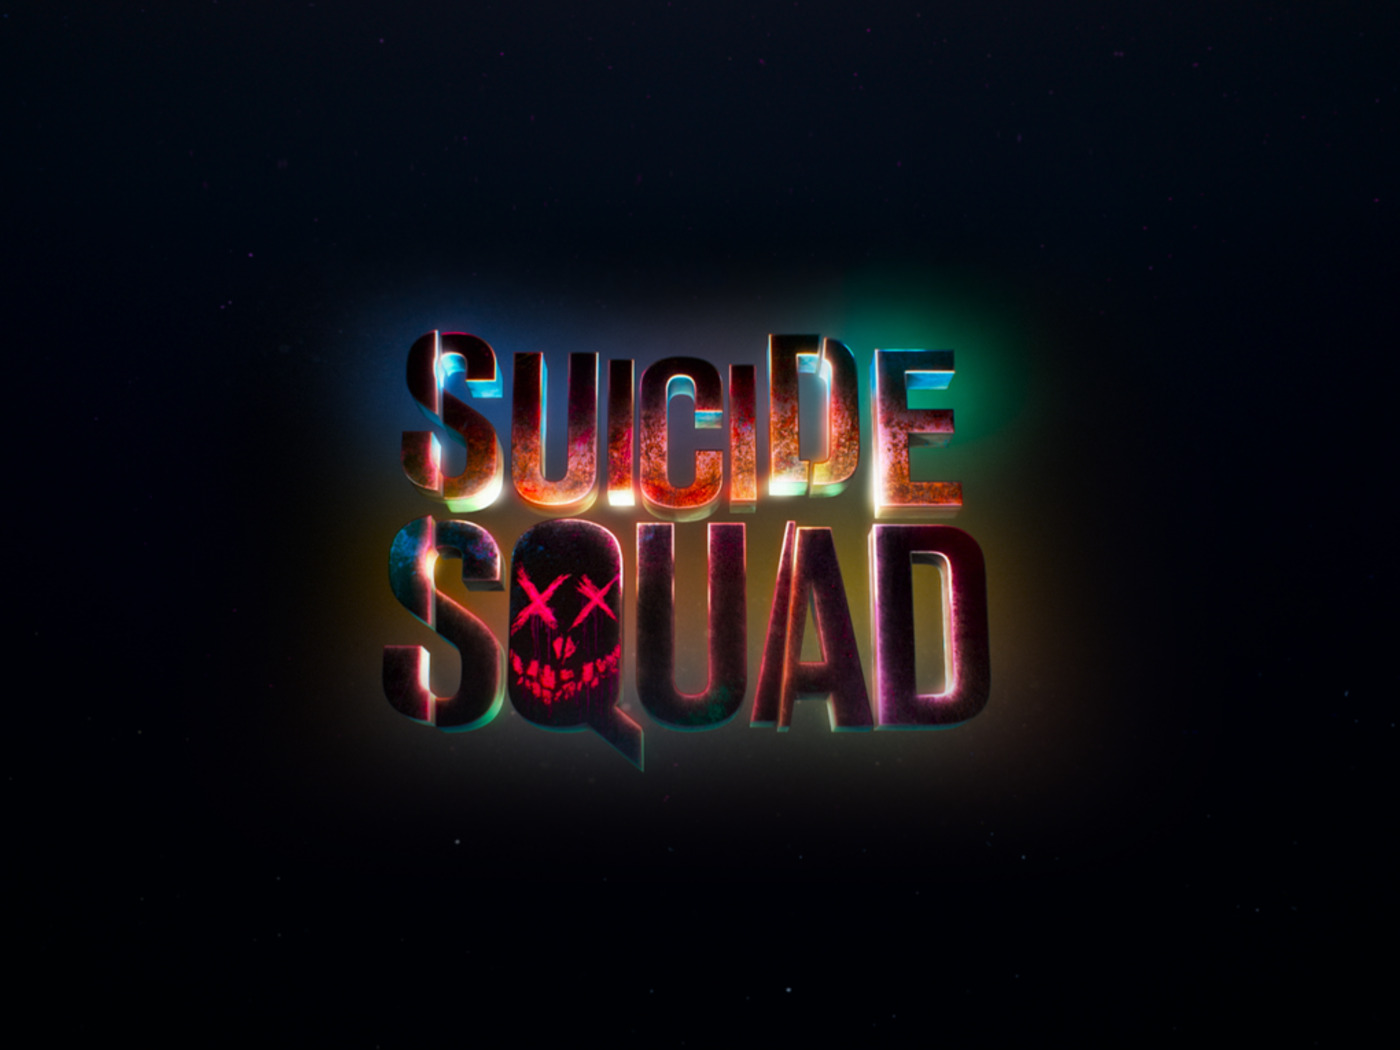 1400x1050 Suicide Squad Logo 1400x1050 Resolution HD 4k